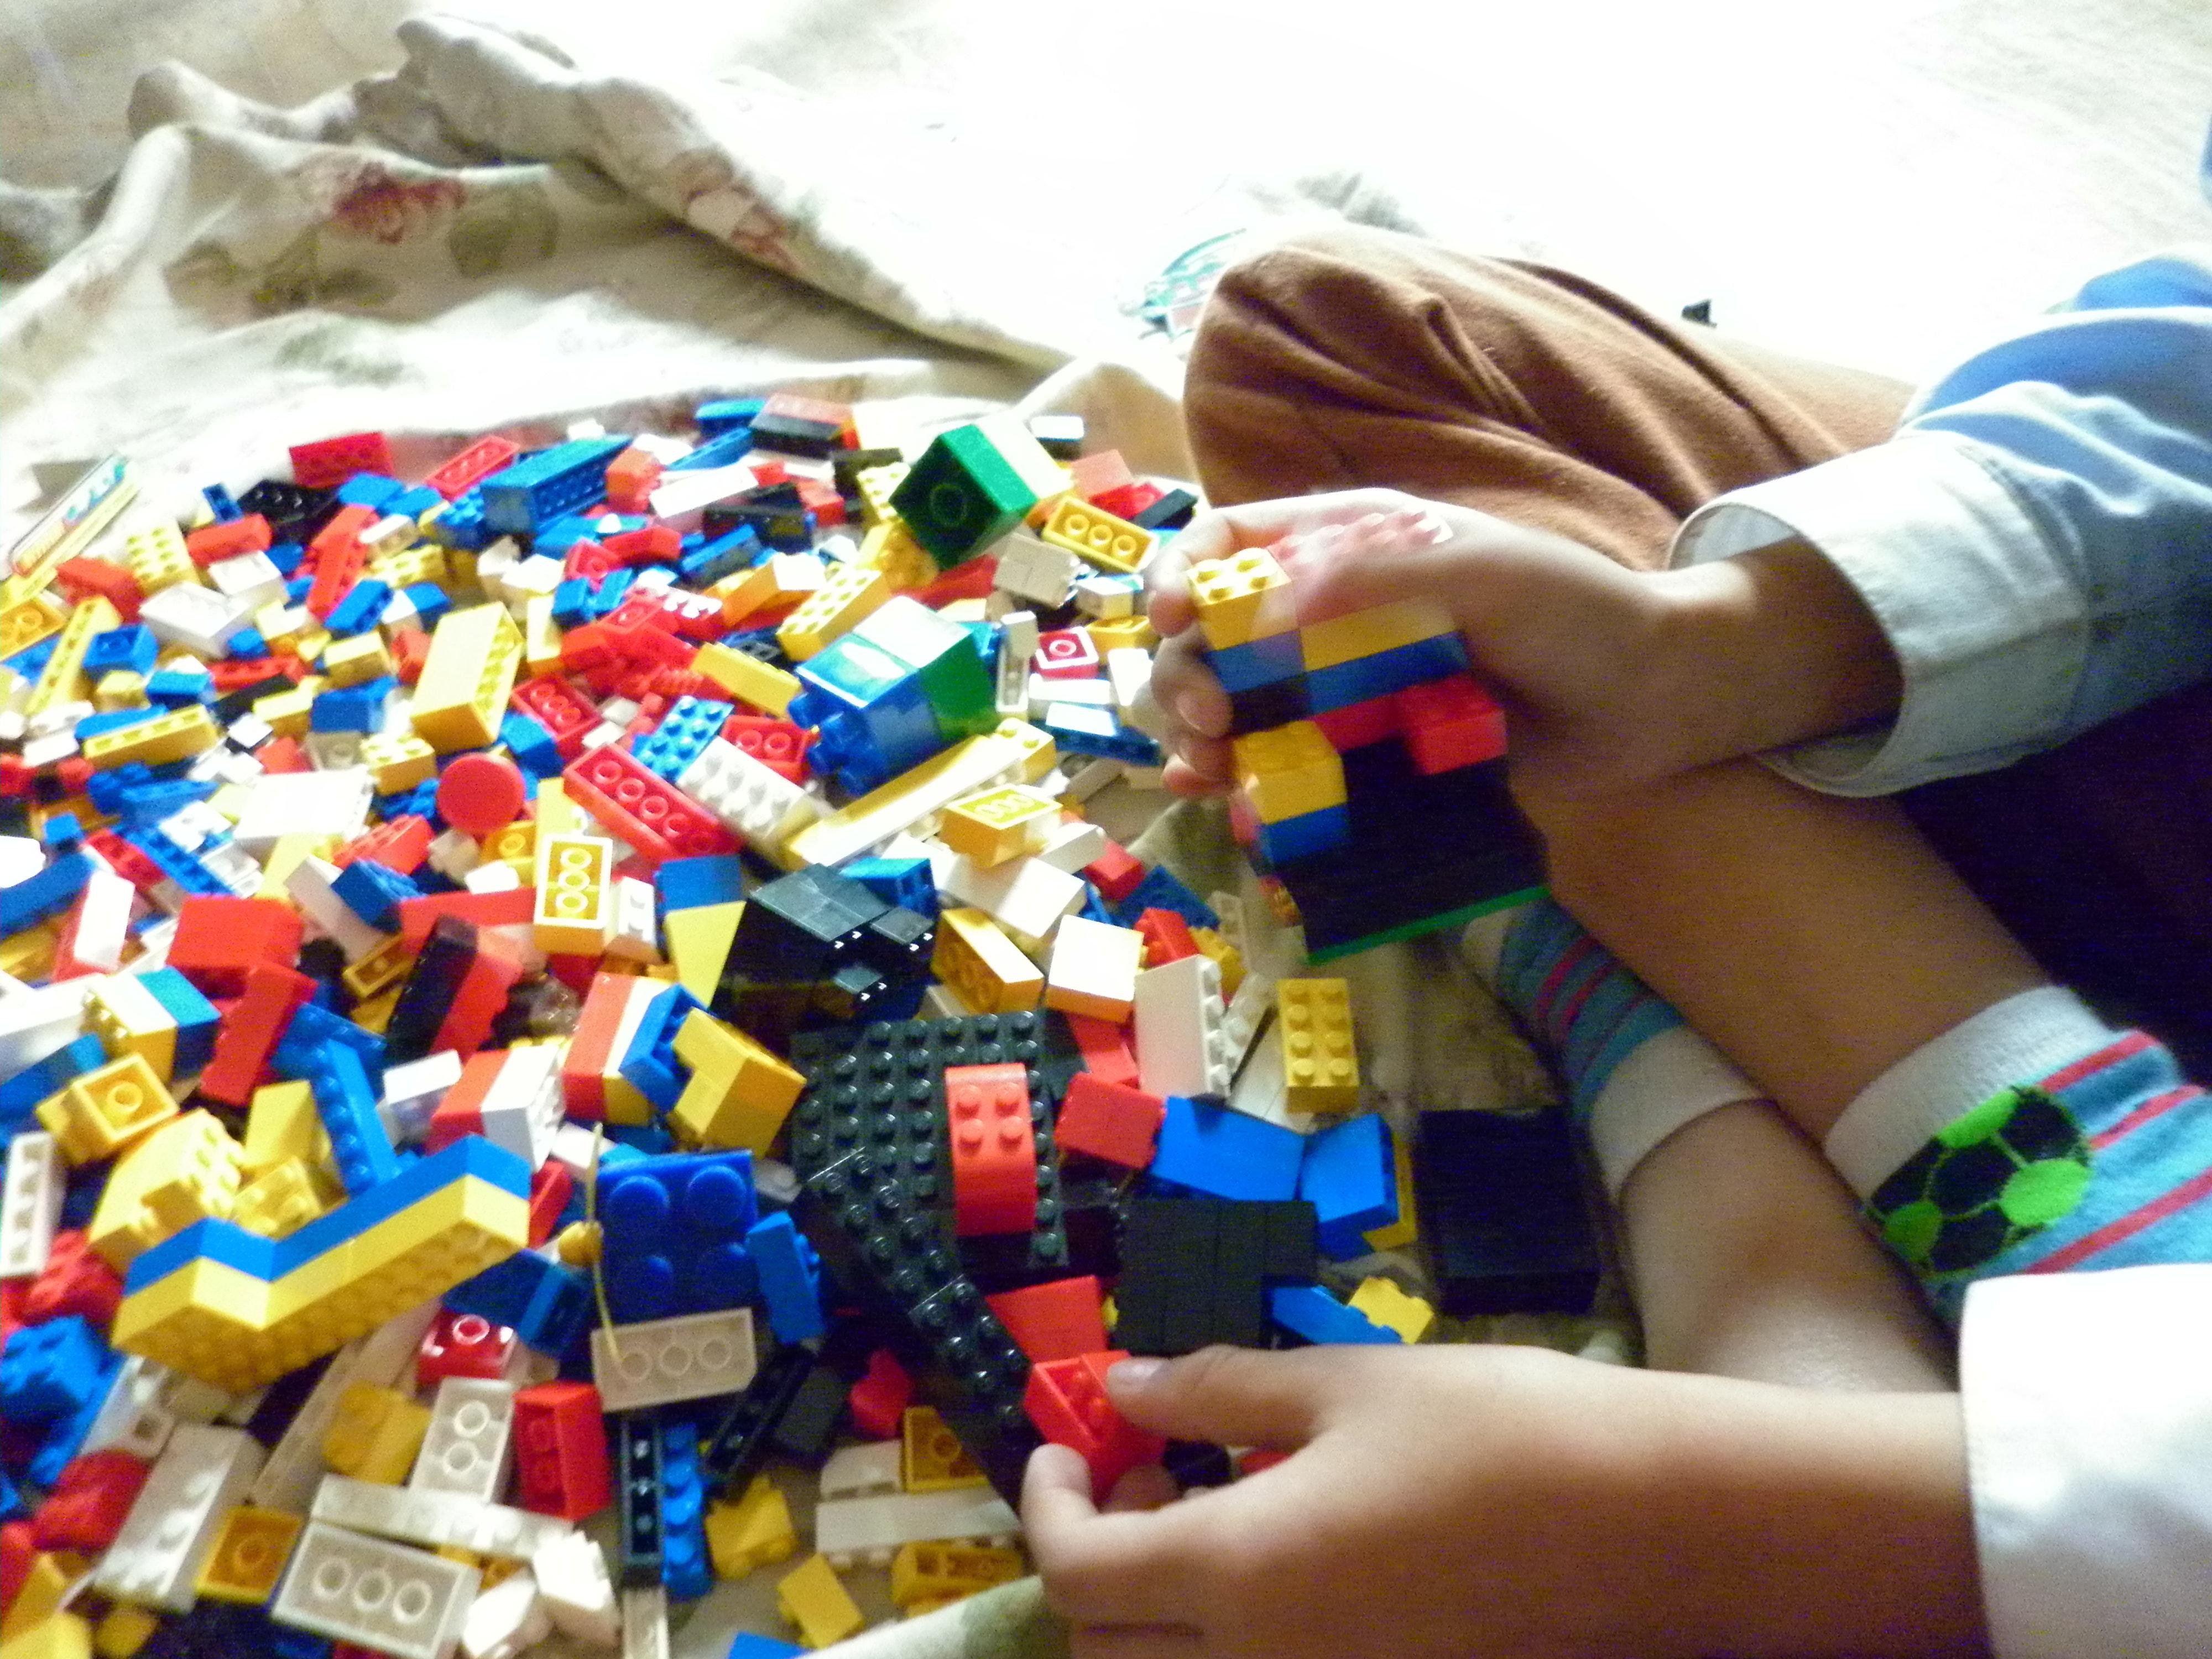 Výsledek obrázku pro kids lego house